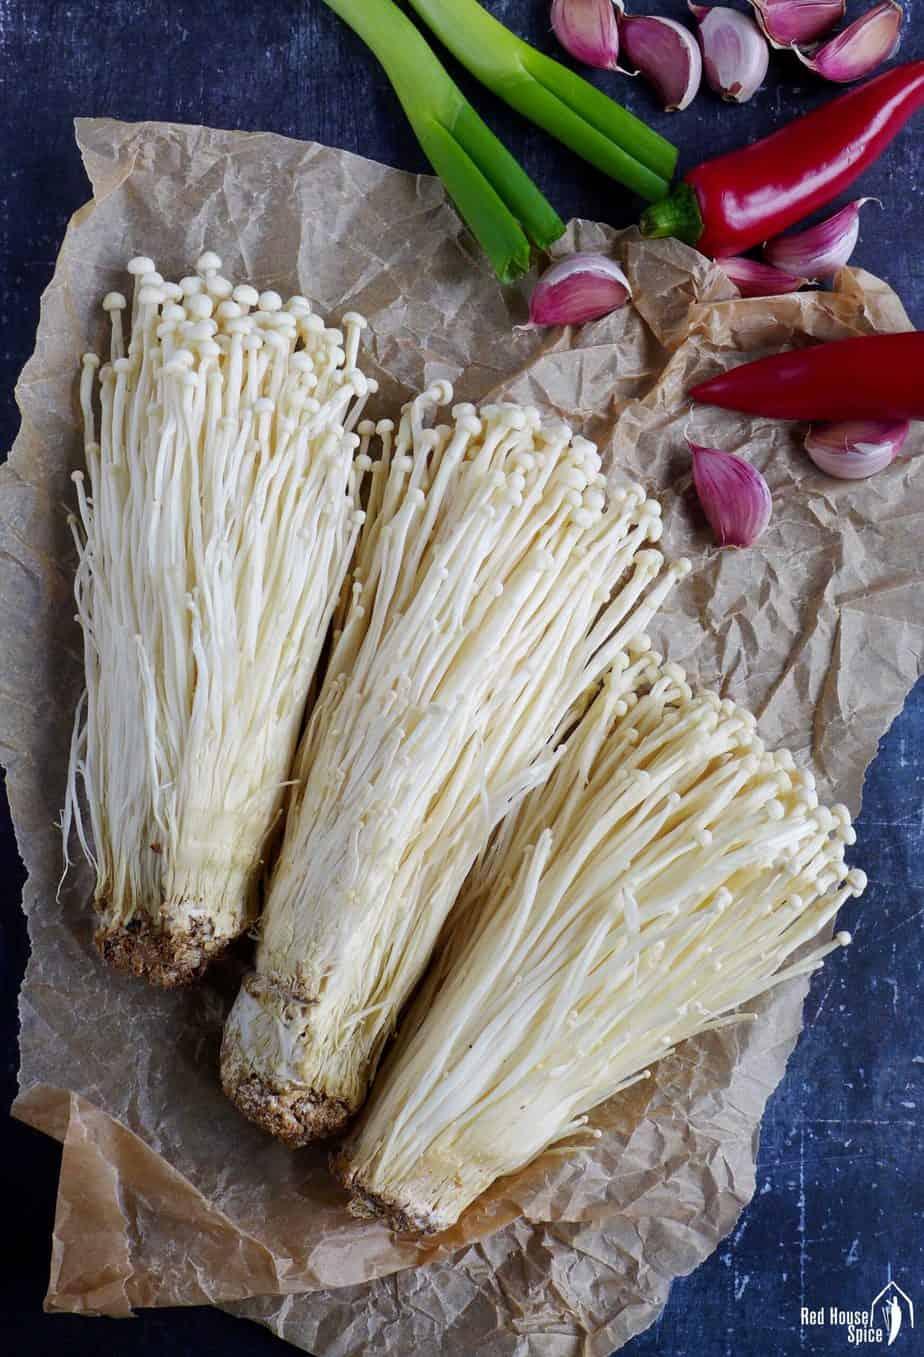 raw enoki mushroom, garlic, chili and scallions